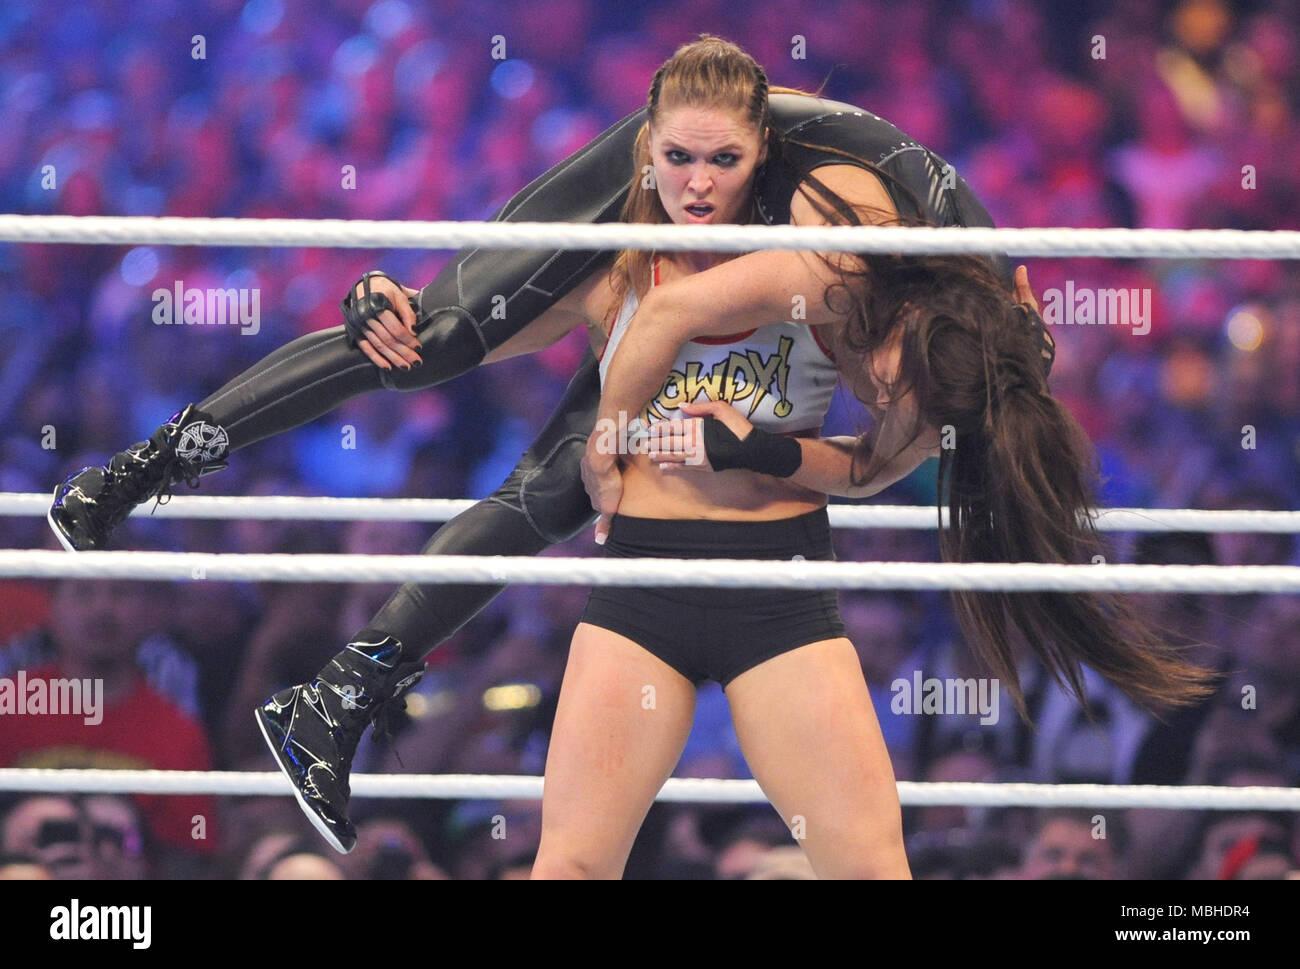 WrestleMania 34: Ronda Rousey And Kurt Angle Vs. Triple H